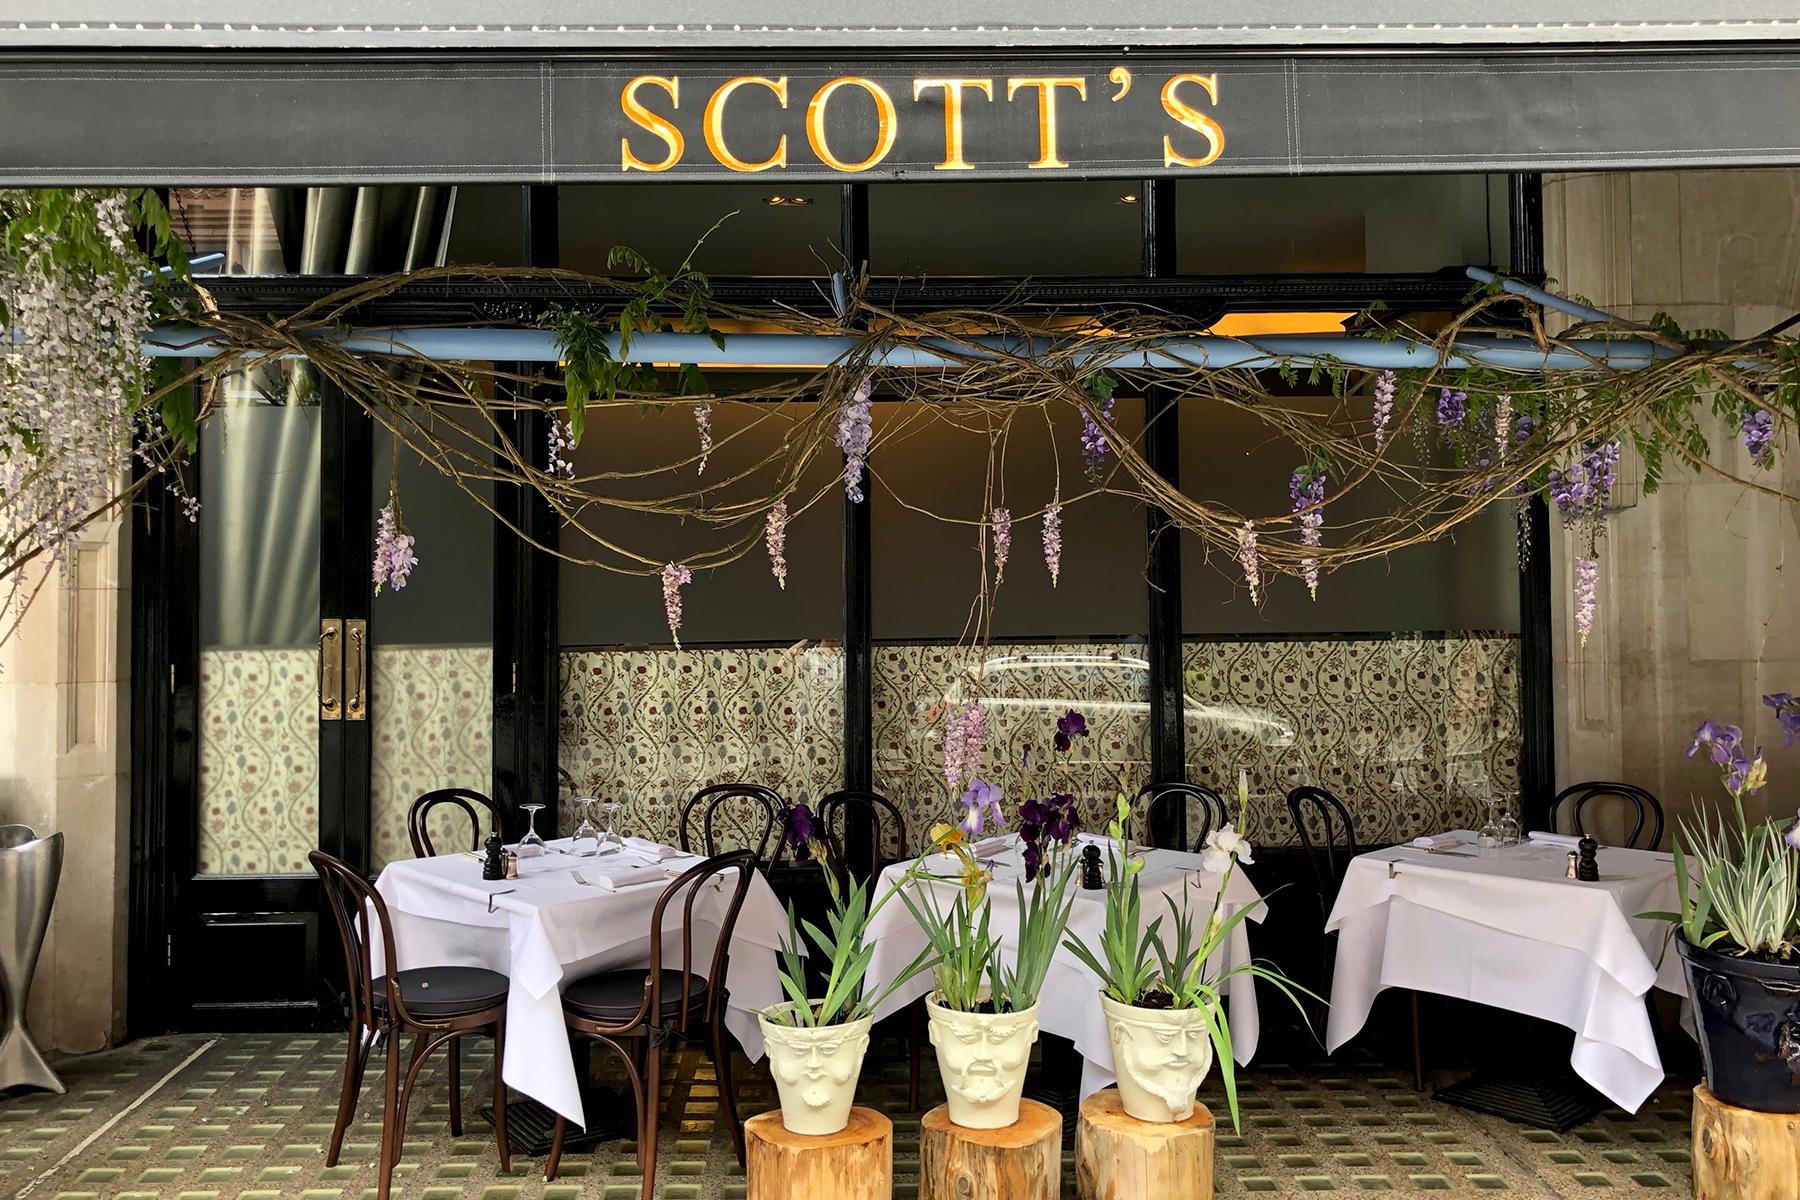 Scotts-inset-8